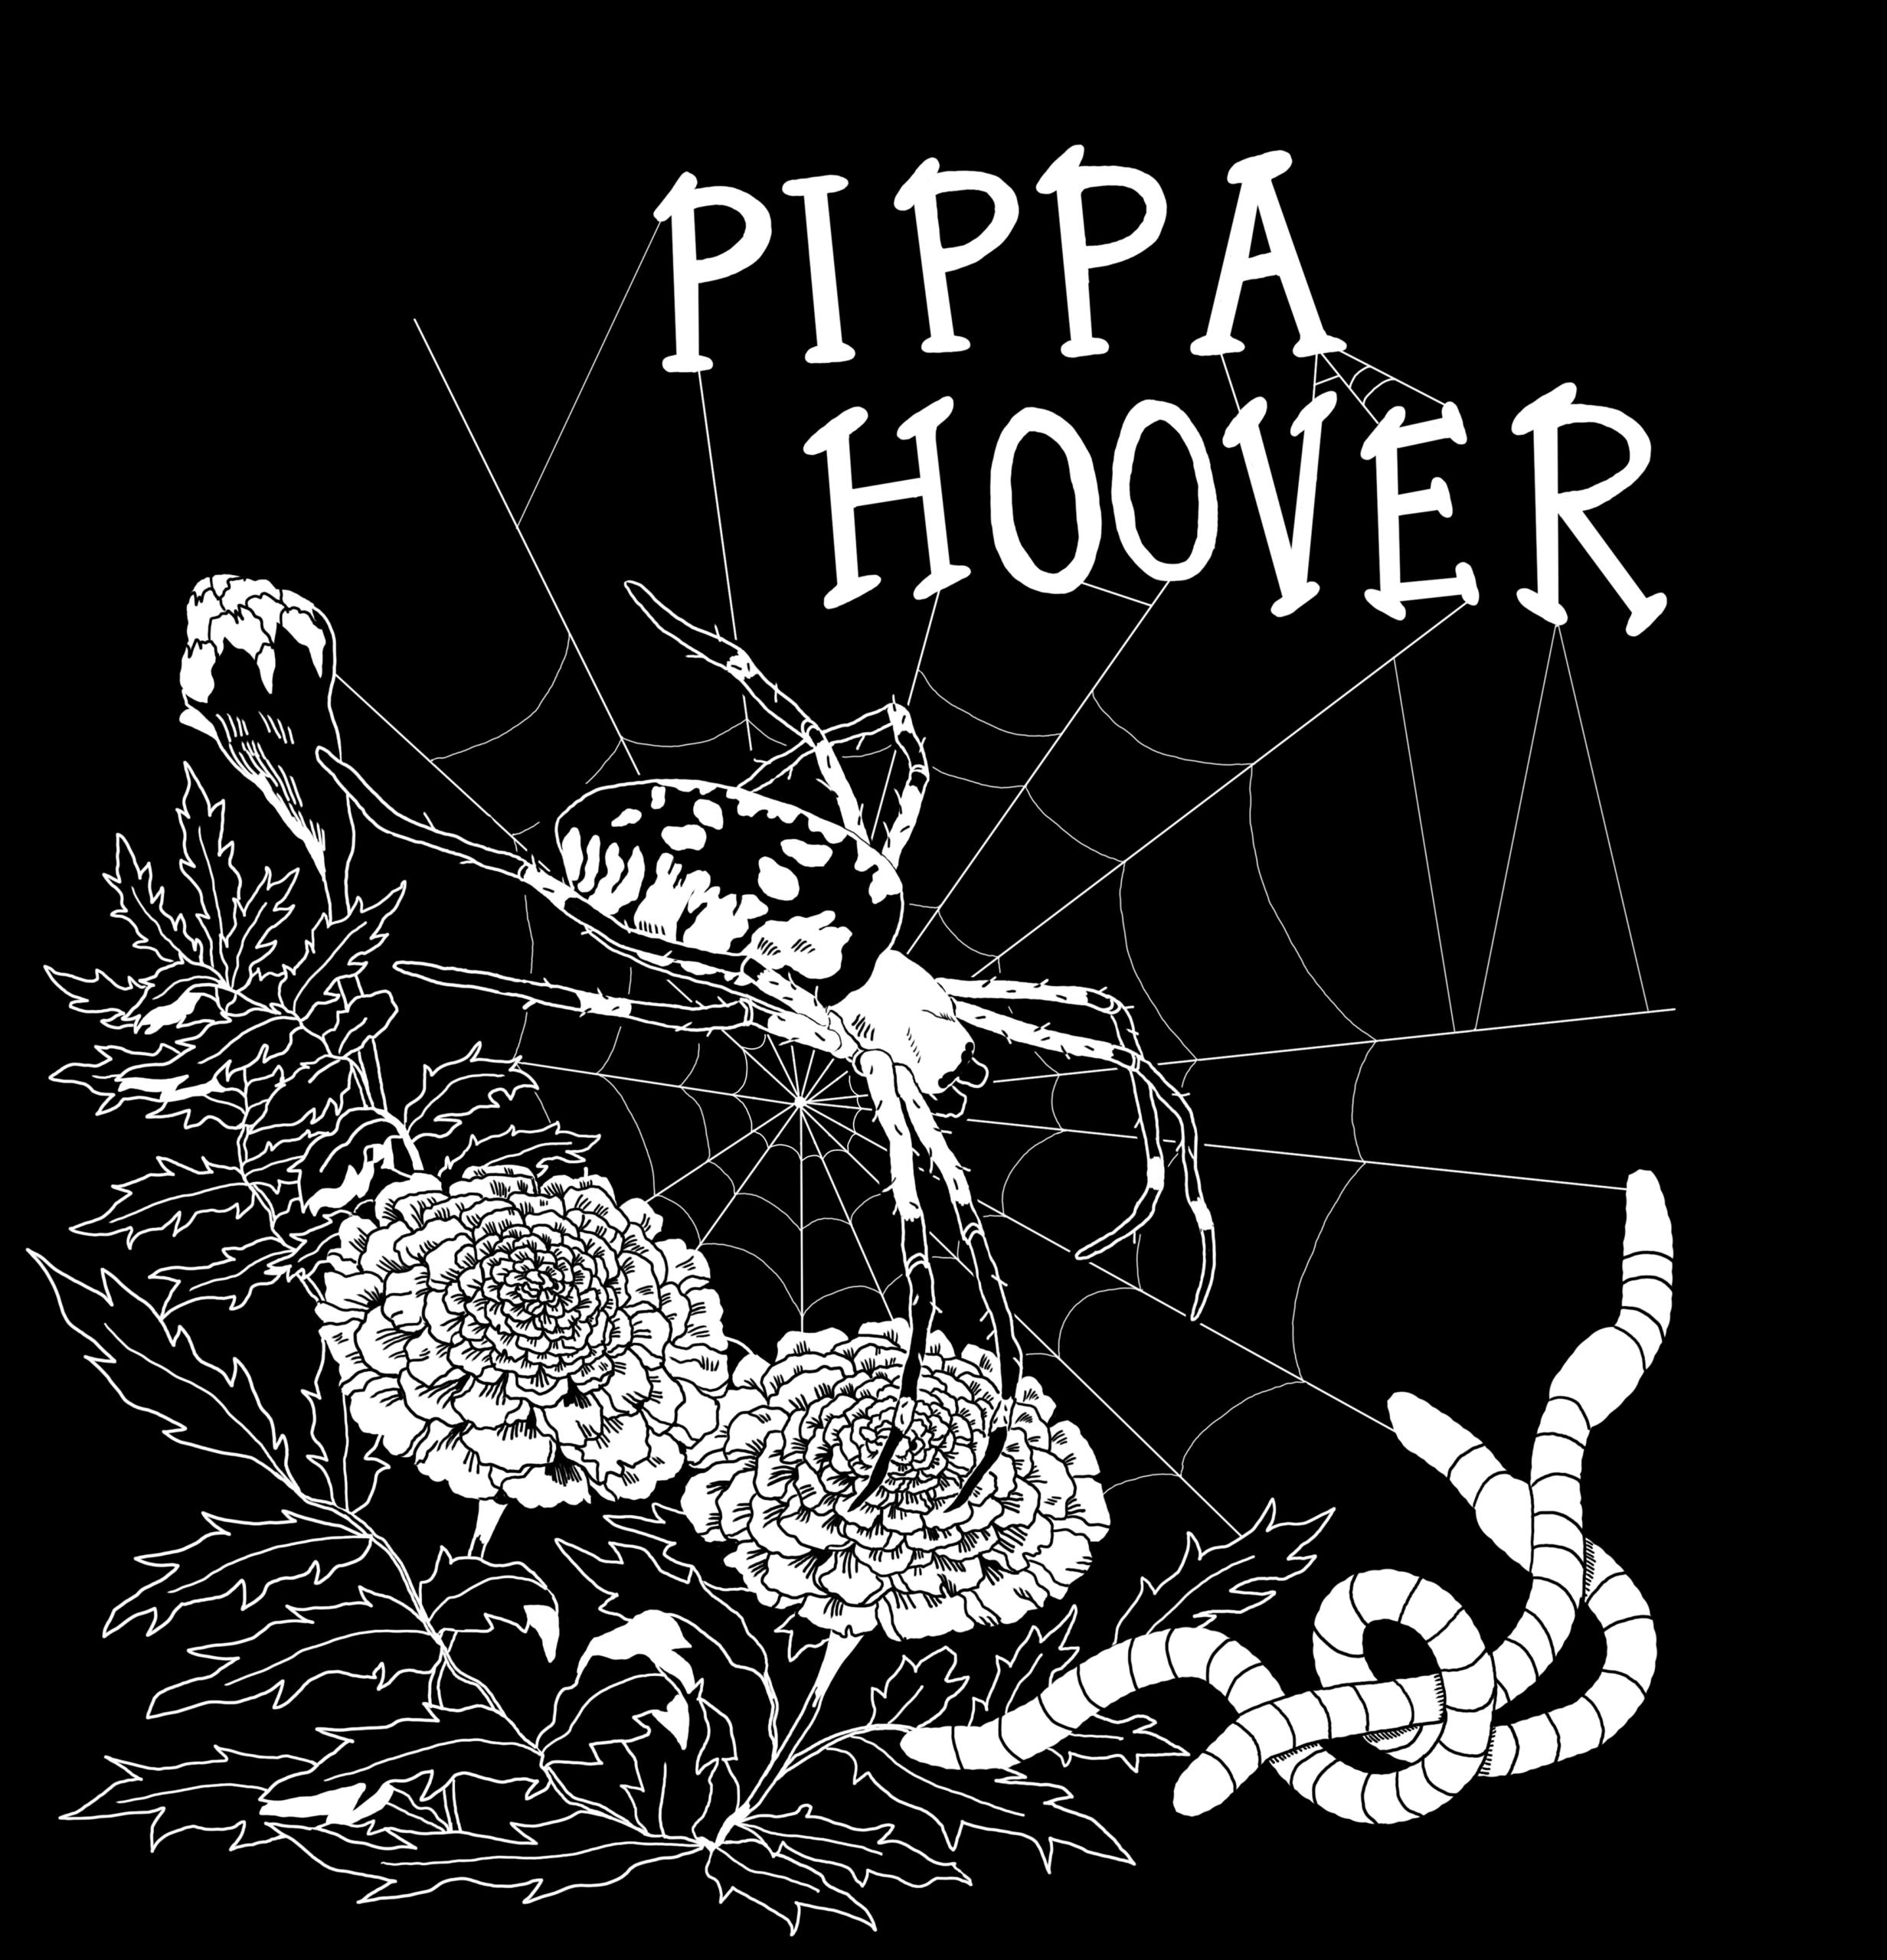 Pippa Hoover Garden Spider logo. <br> Art by Laura Hamon.